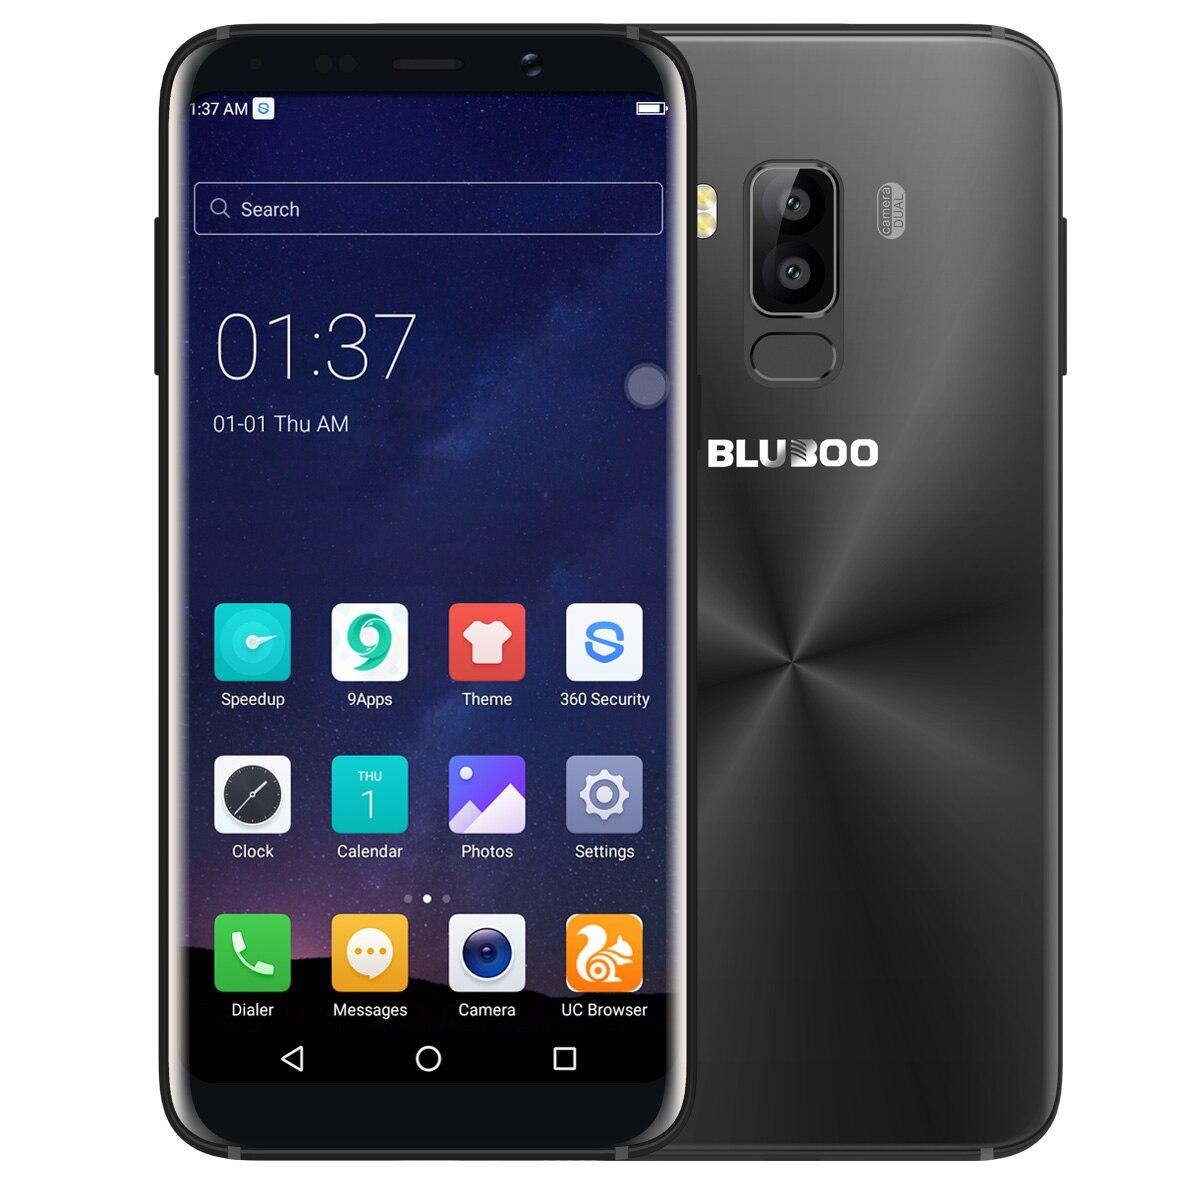 Bluboo S8 5.7 pouce 4g Smartphone Android 7.0 18:9 Plein Écran MTK6750T Octa Core 3 gb RAM 32 gb ROM Double Caméras Arrière